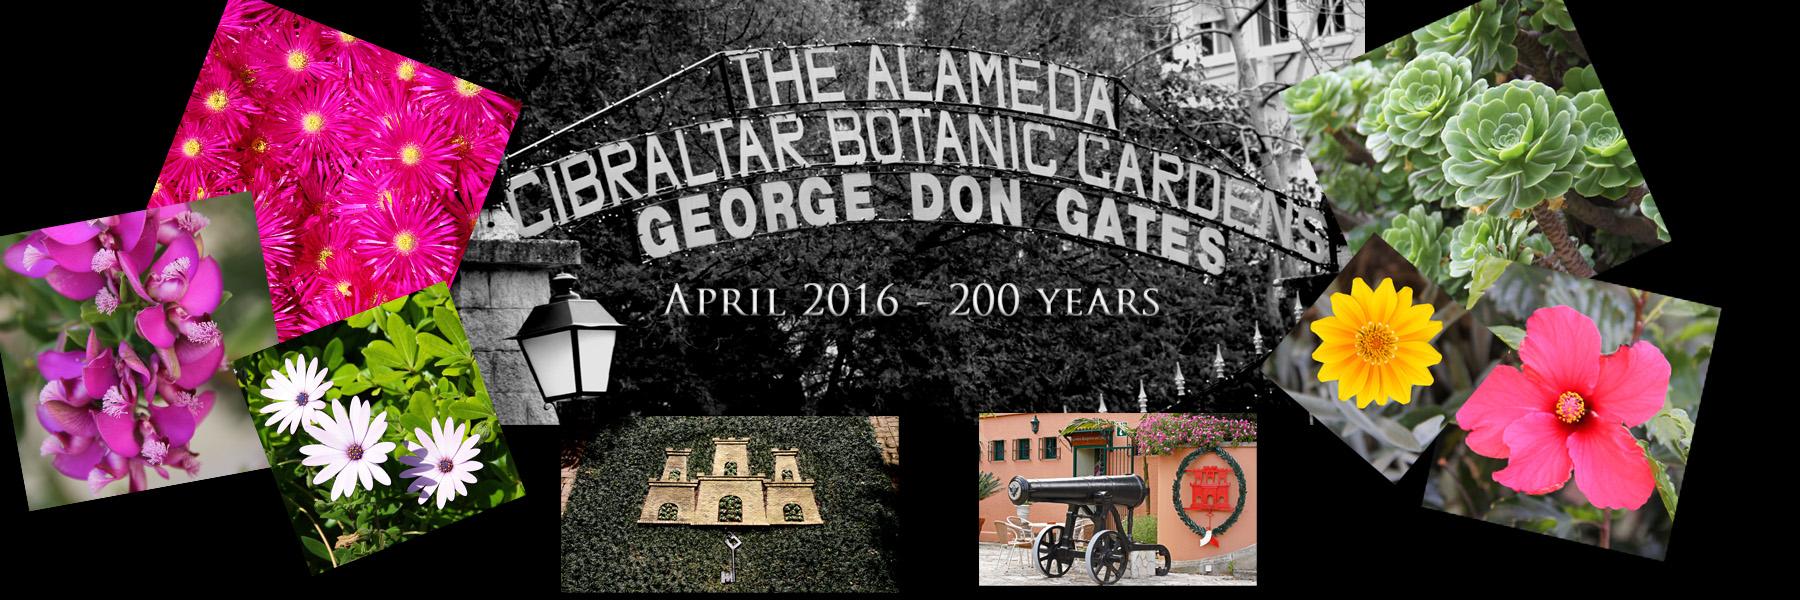 Botanical Gardens 200 years